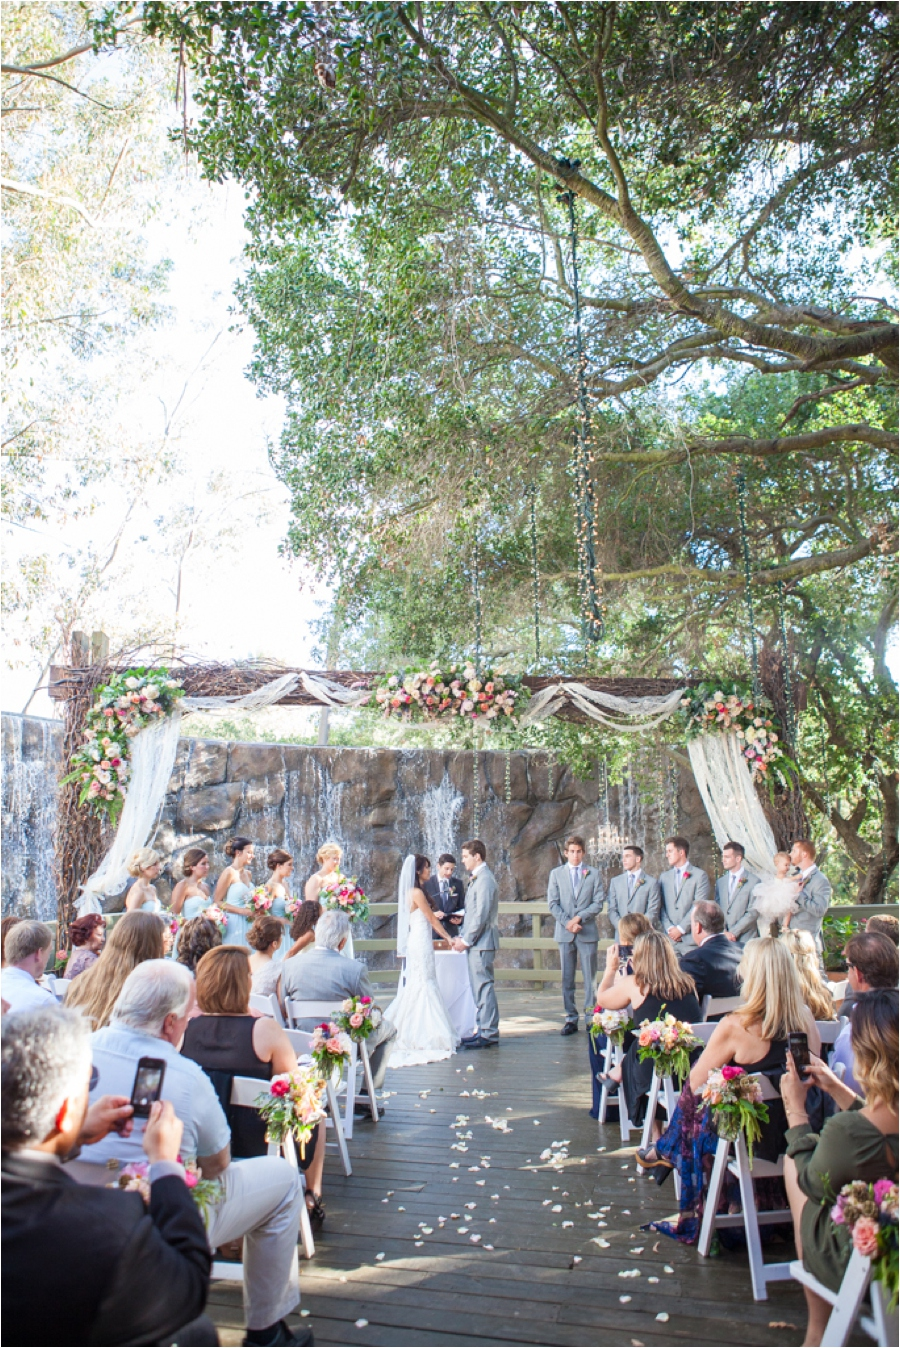 Jasmine and Donny- Calamigos Ranch Wedding ©Shaun and Skyla Walton-169.jpg